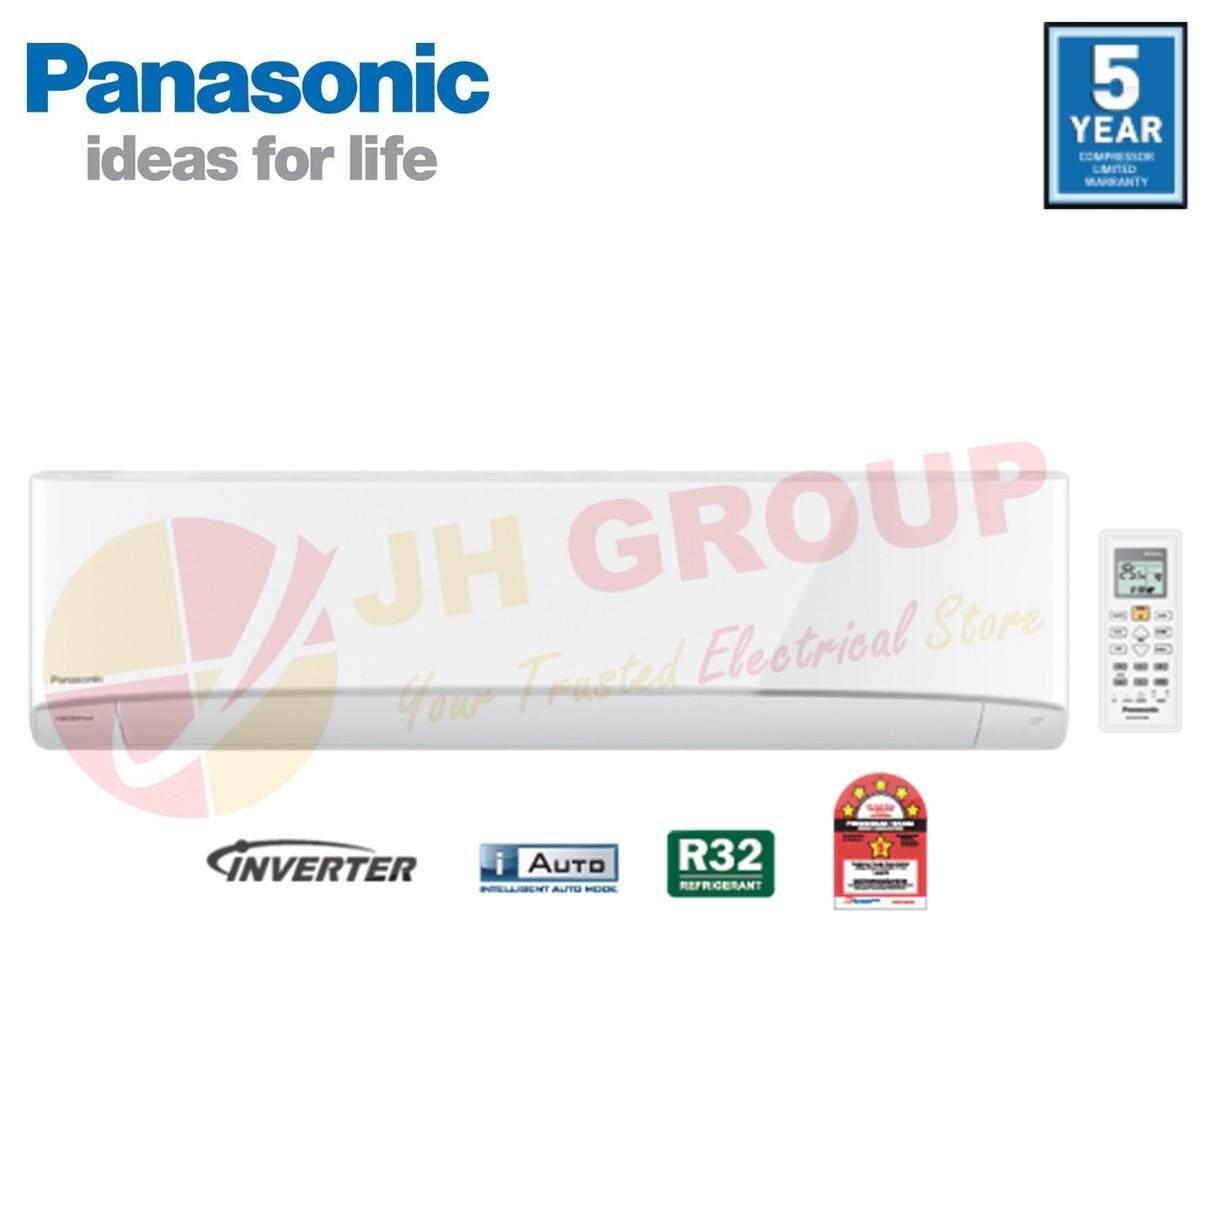 PANASONIC CS-PU24VKH / CU-PU24VKH 2.5 HP STANDARD INVERTER R32 AERO SERIES AIR-CONDITIONER